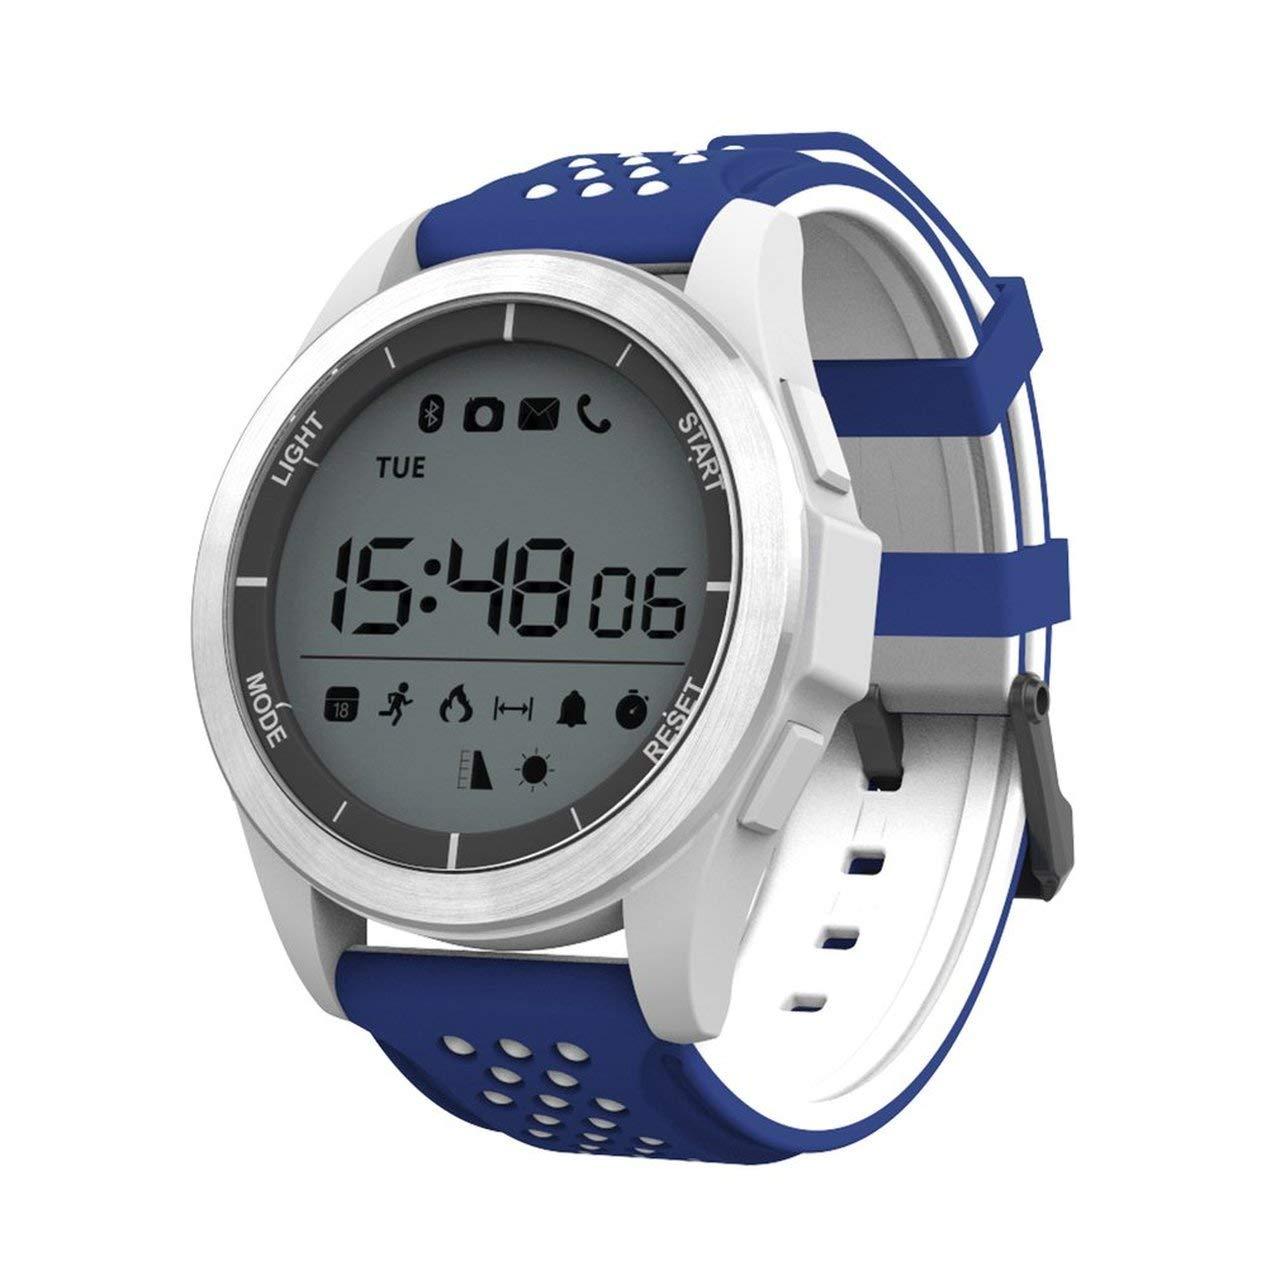 fEStprintse NO.1 F3 Sports Smartwatch Rotatable Dial 30m ...